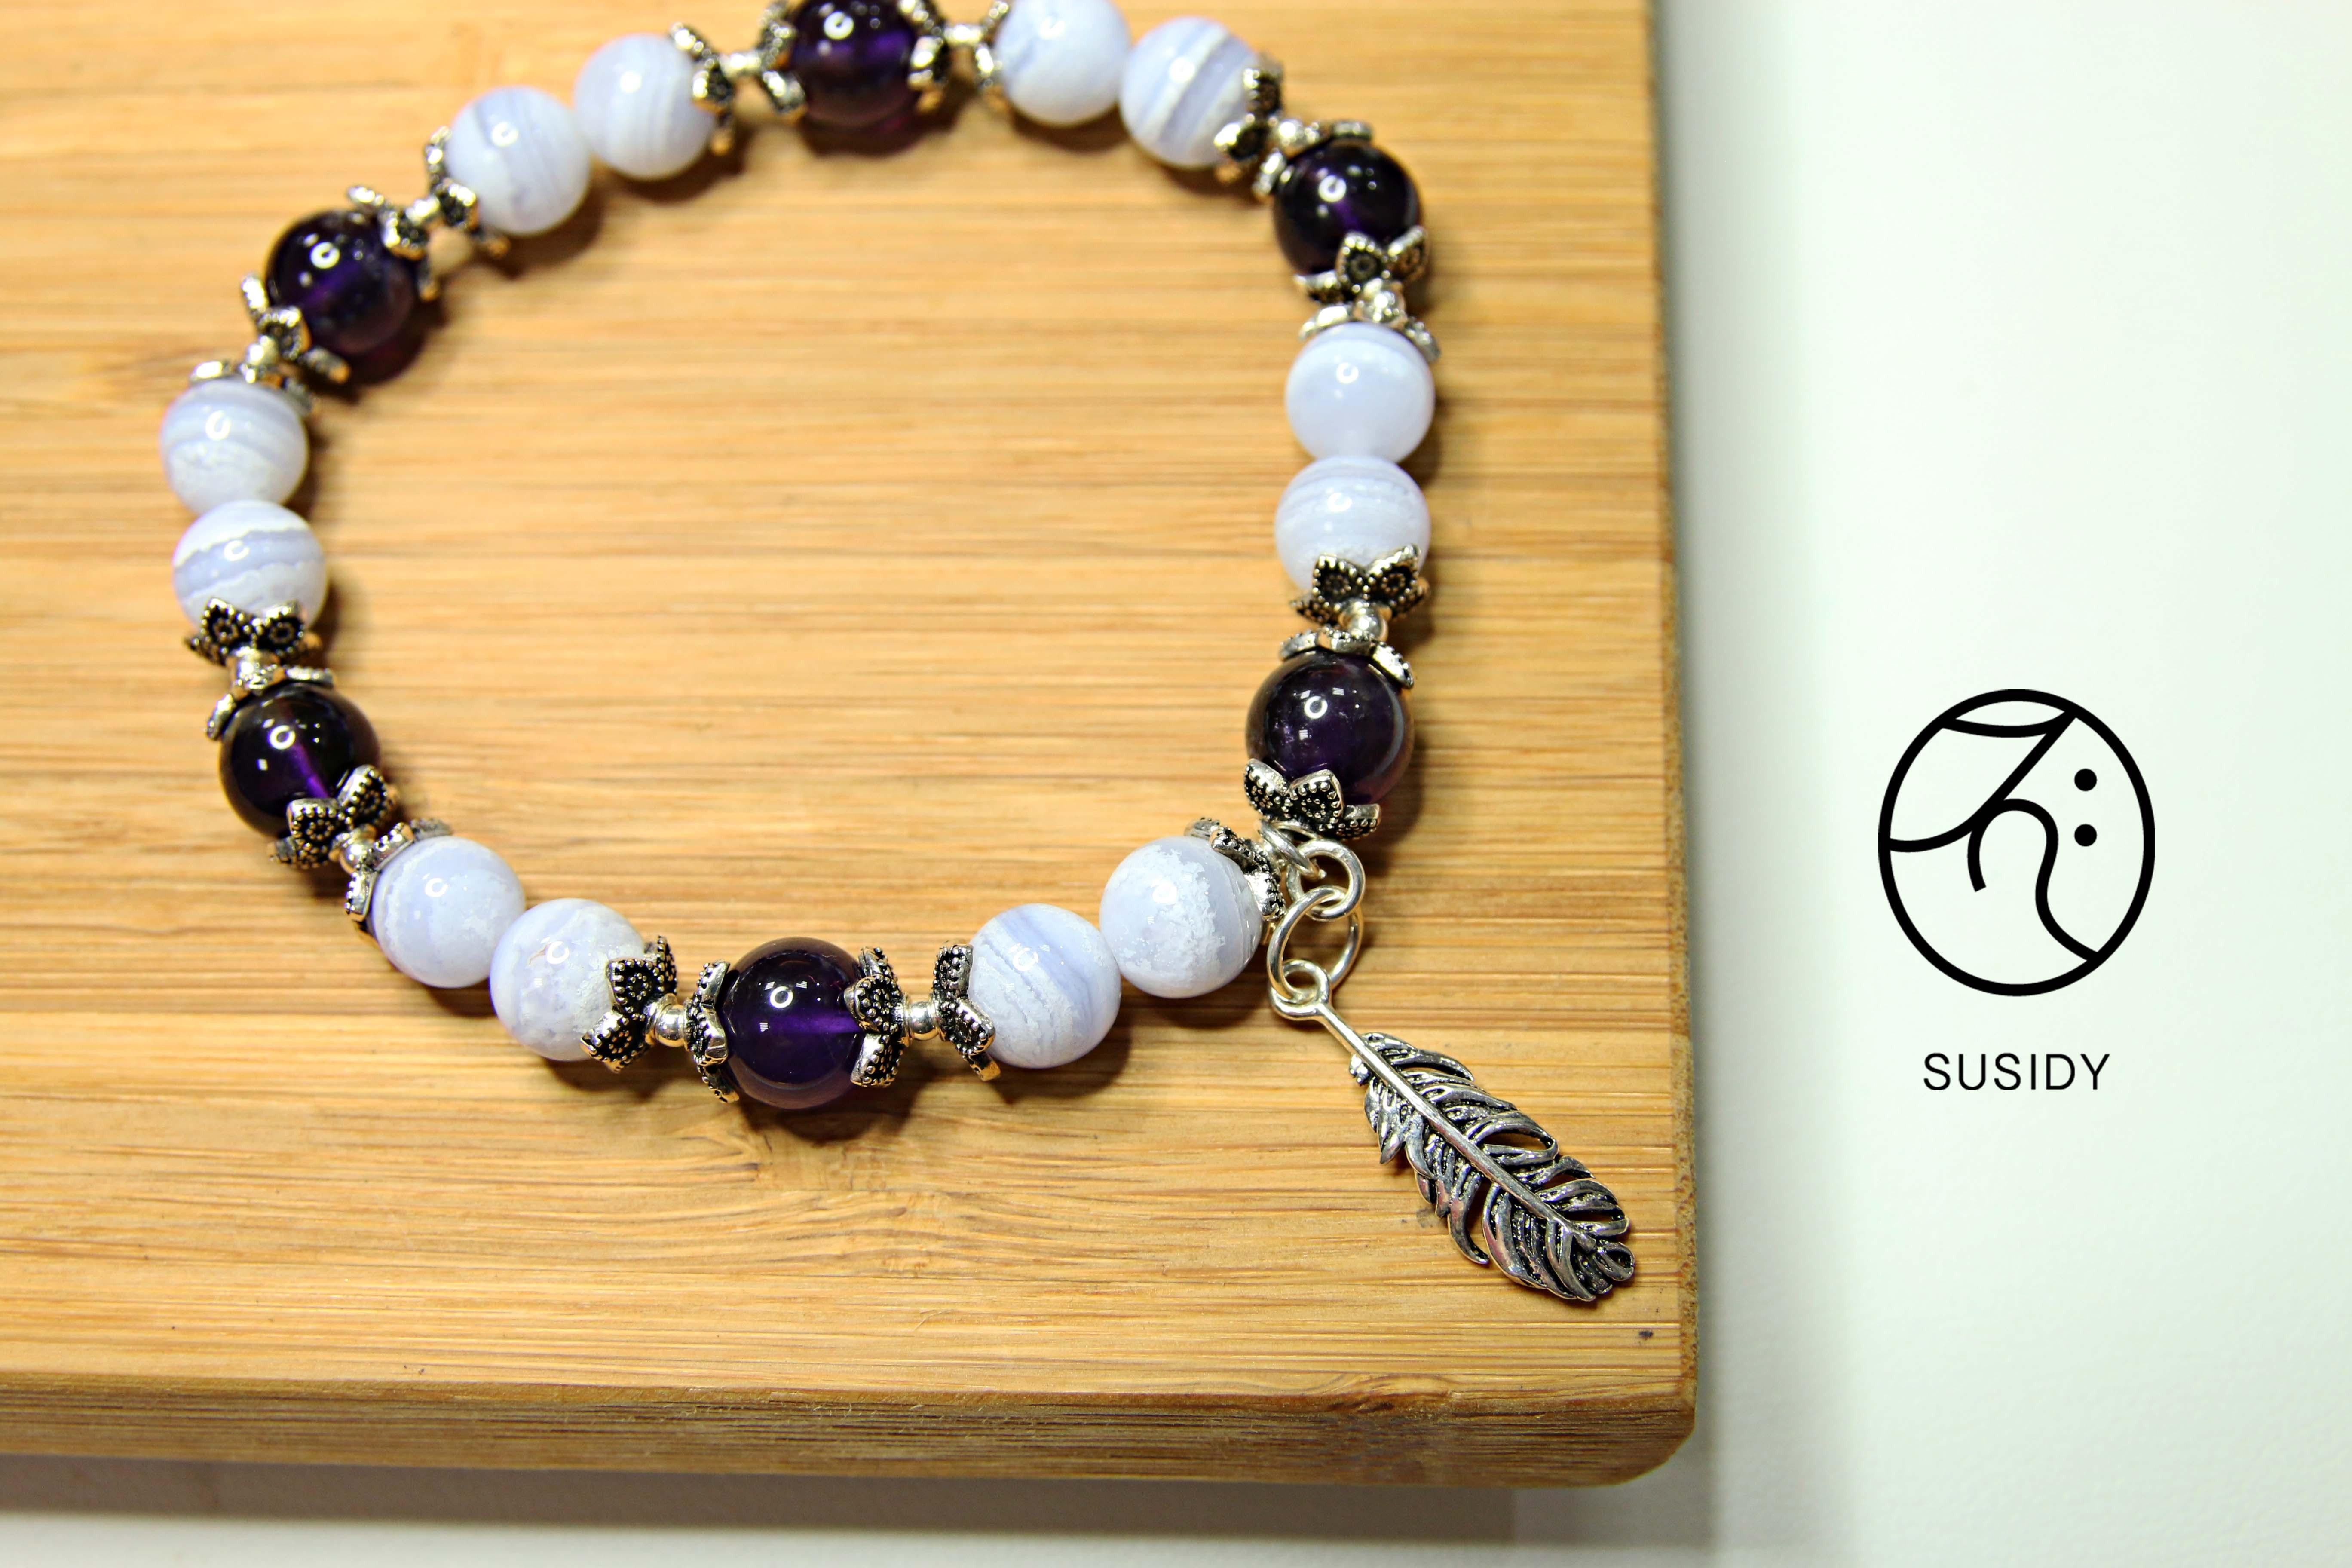 SusidyDesign - 藍紋瑪瑙 手珠銀飾